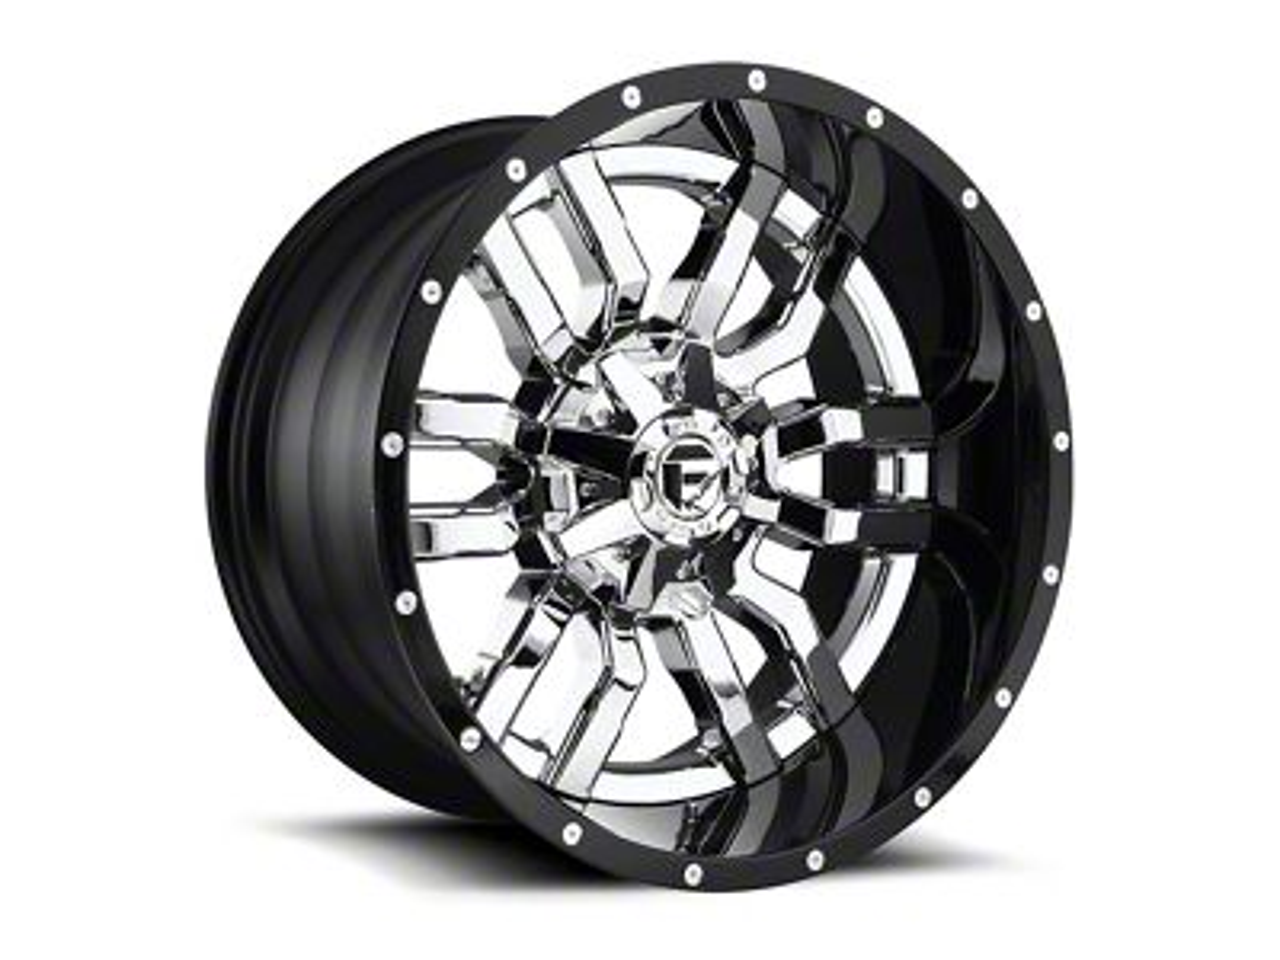 Fuel Wheels Sledge Chrome 5-Lug Wheel - 22x14 (02-18 RAM 1500, Excluding Mega Cab)